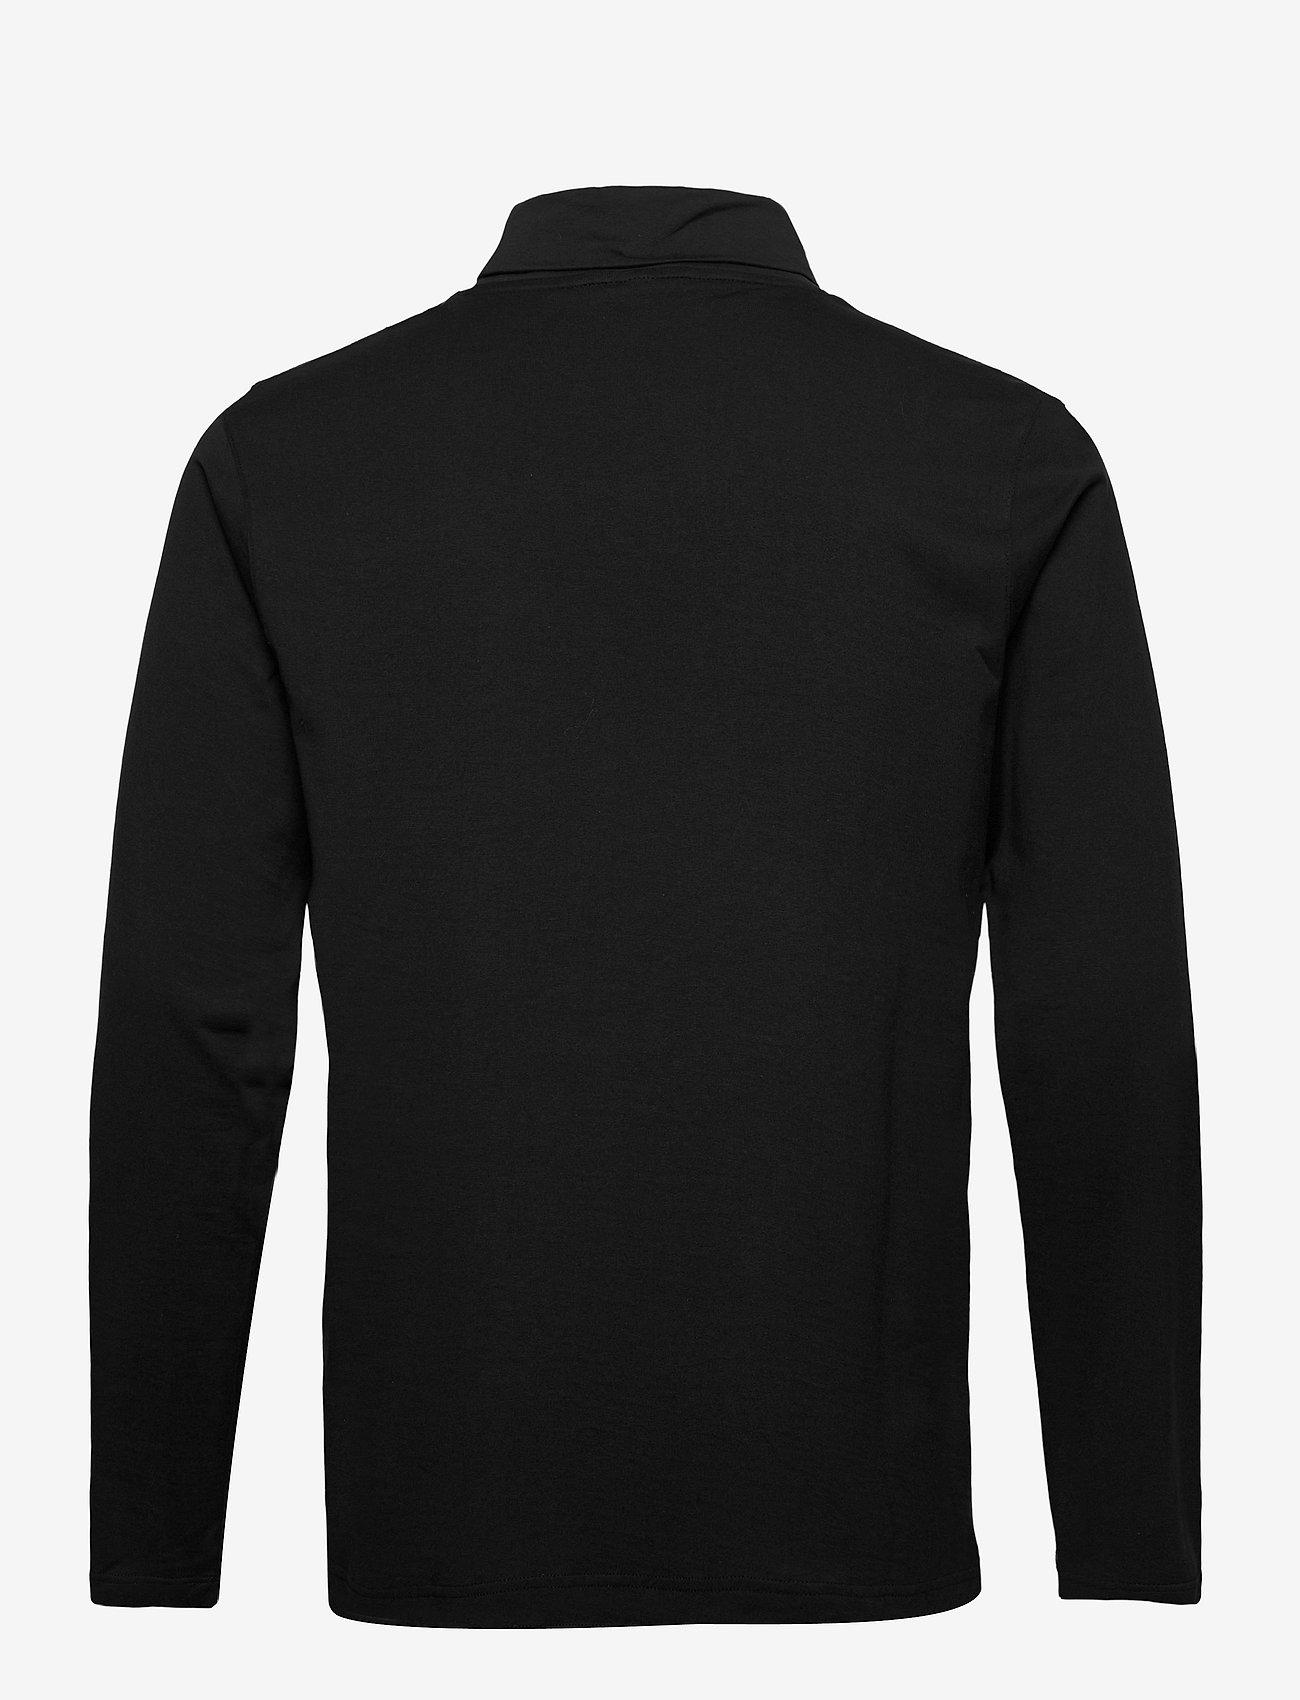 adidas Originals ADV BASE LAYER - T-skjorter BLACK - Menn Klær